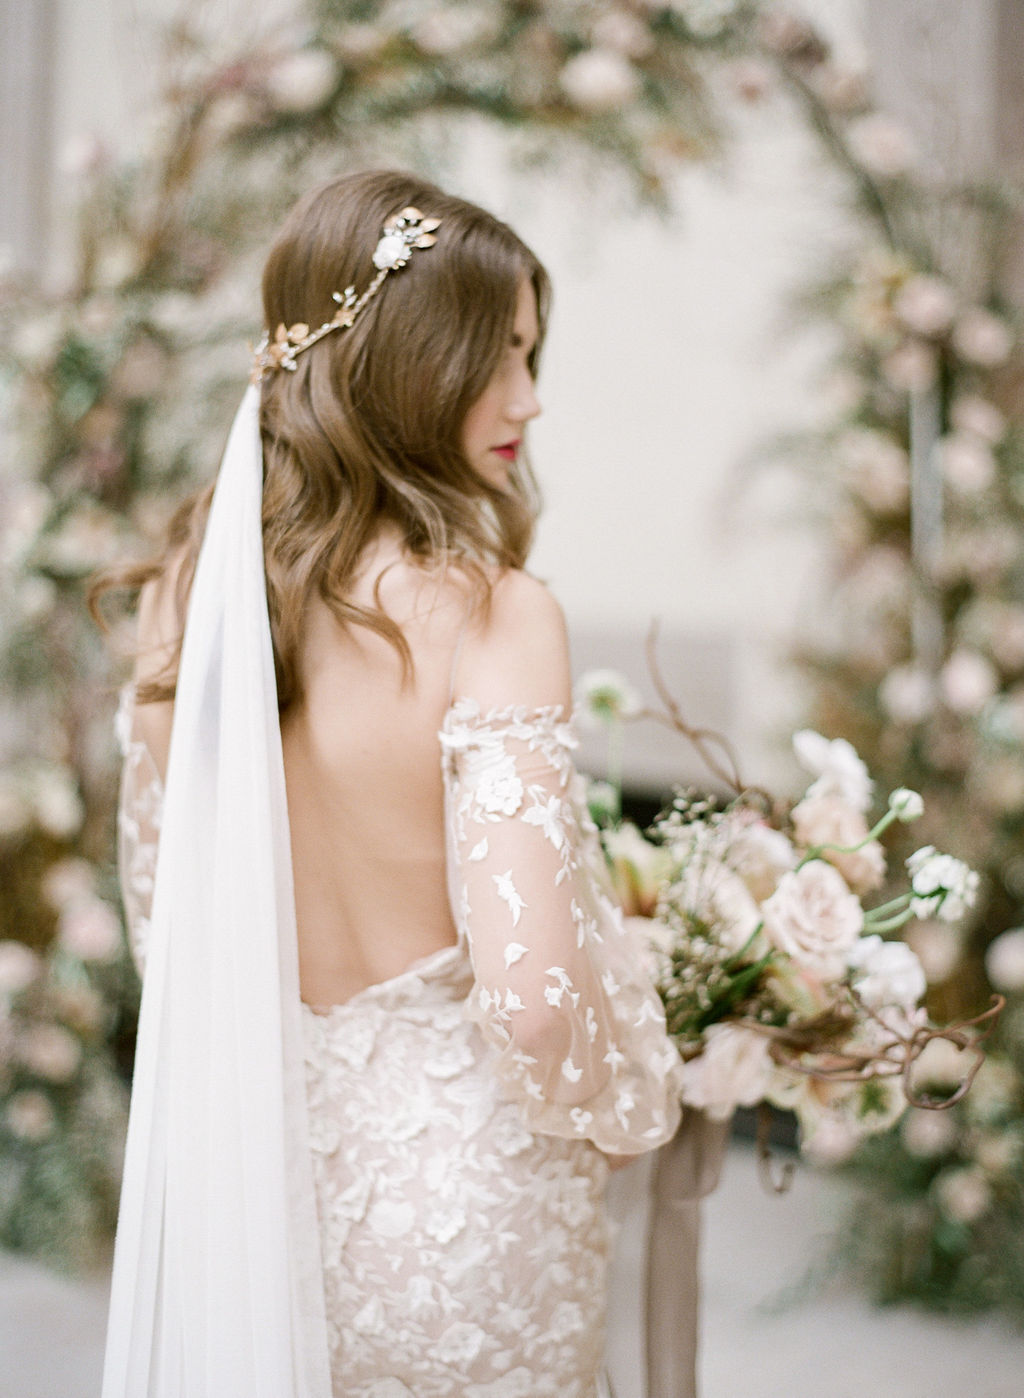 artiese-ago-wedding-editorial-000423690004.jpg